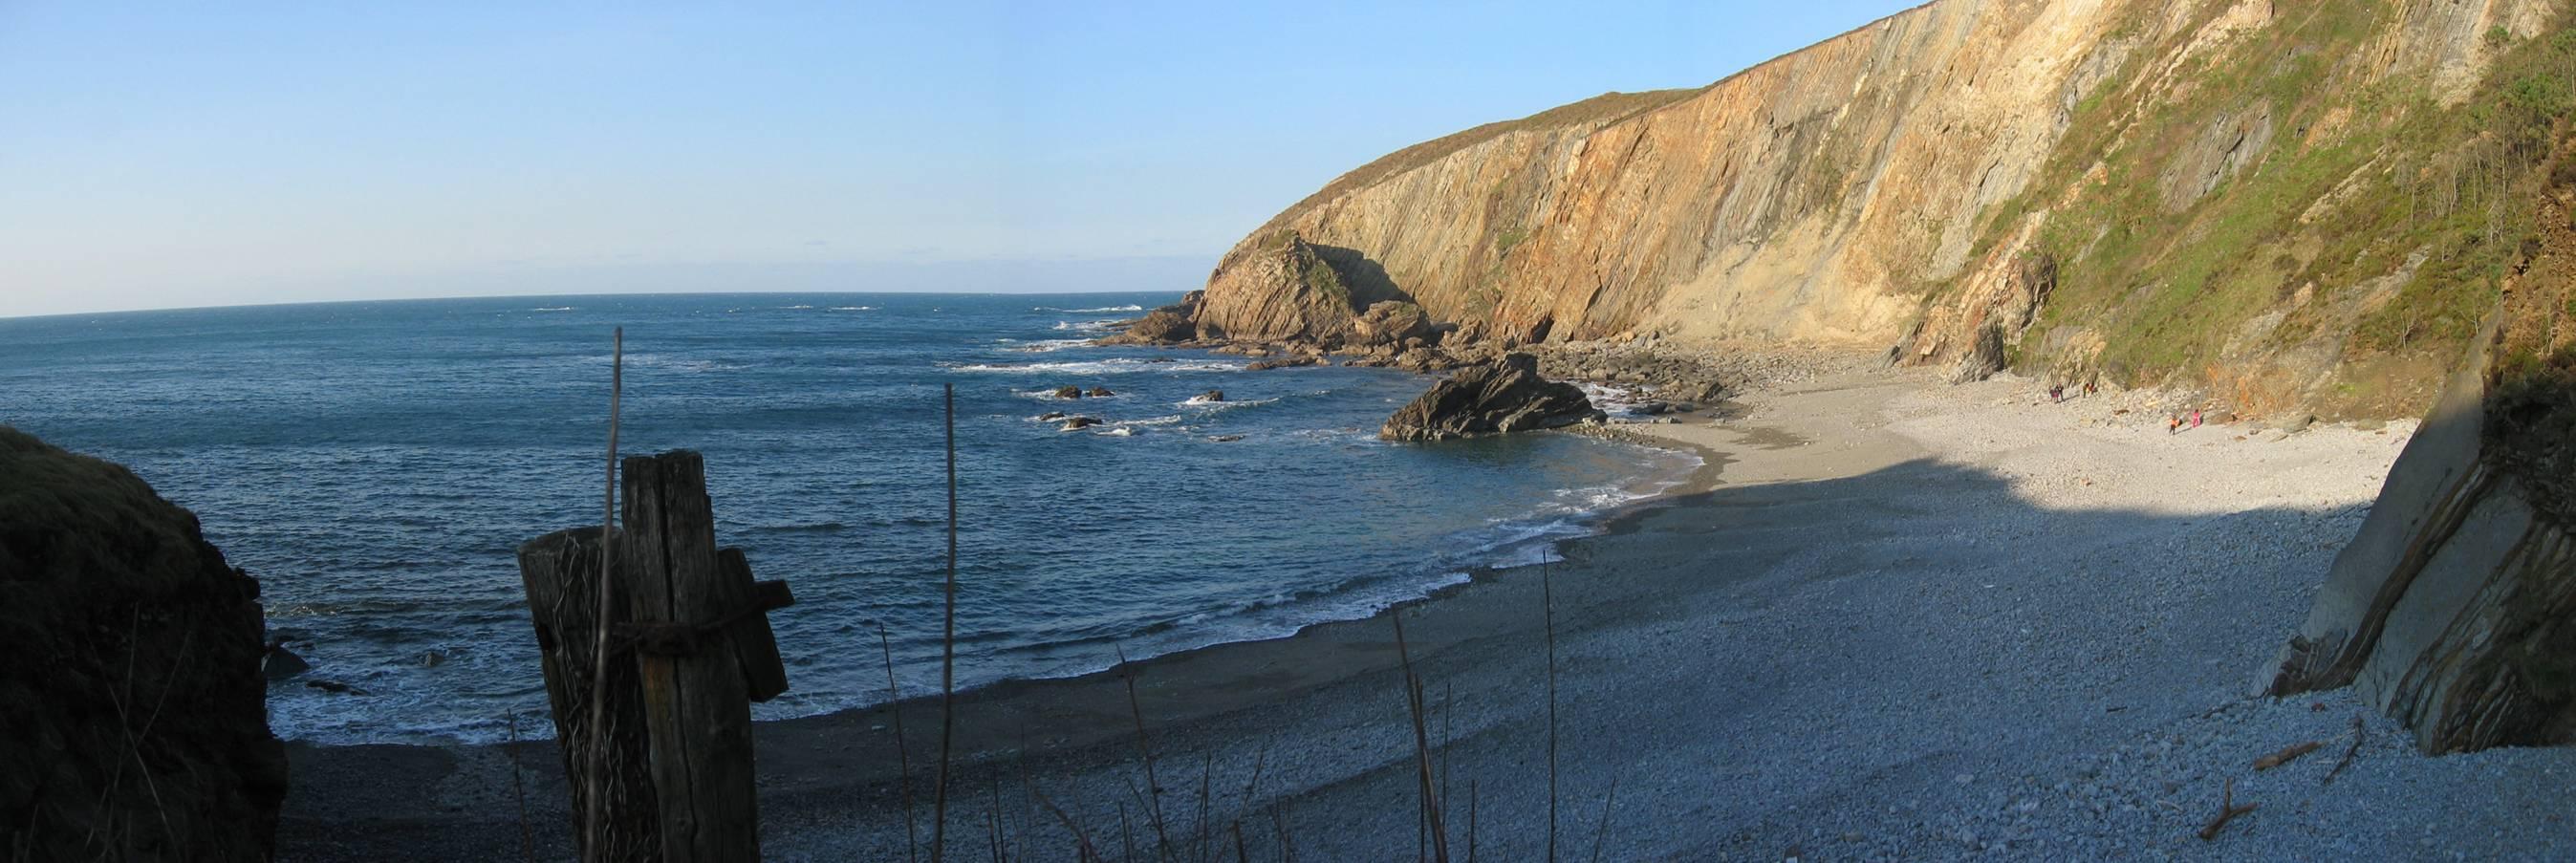 Foto playa Bozo. Playa de Bozu.